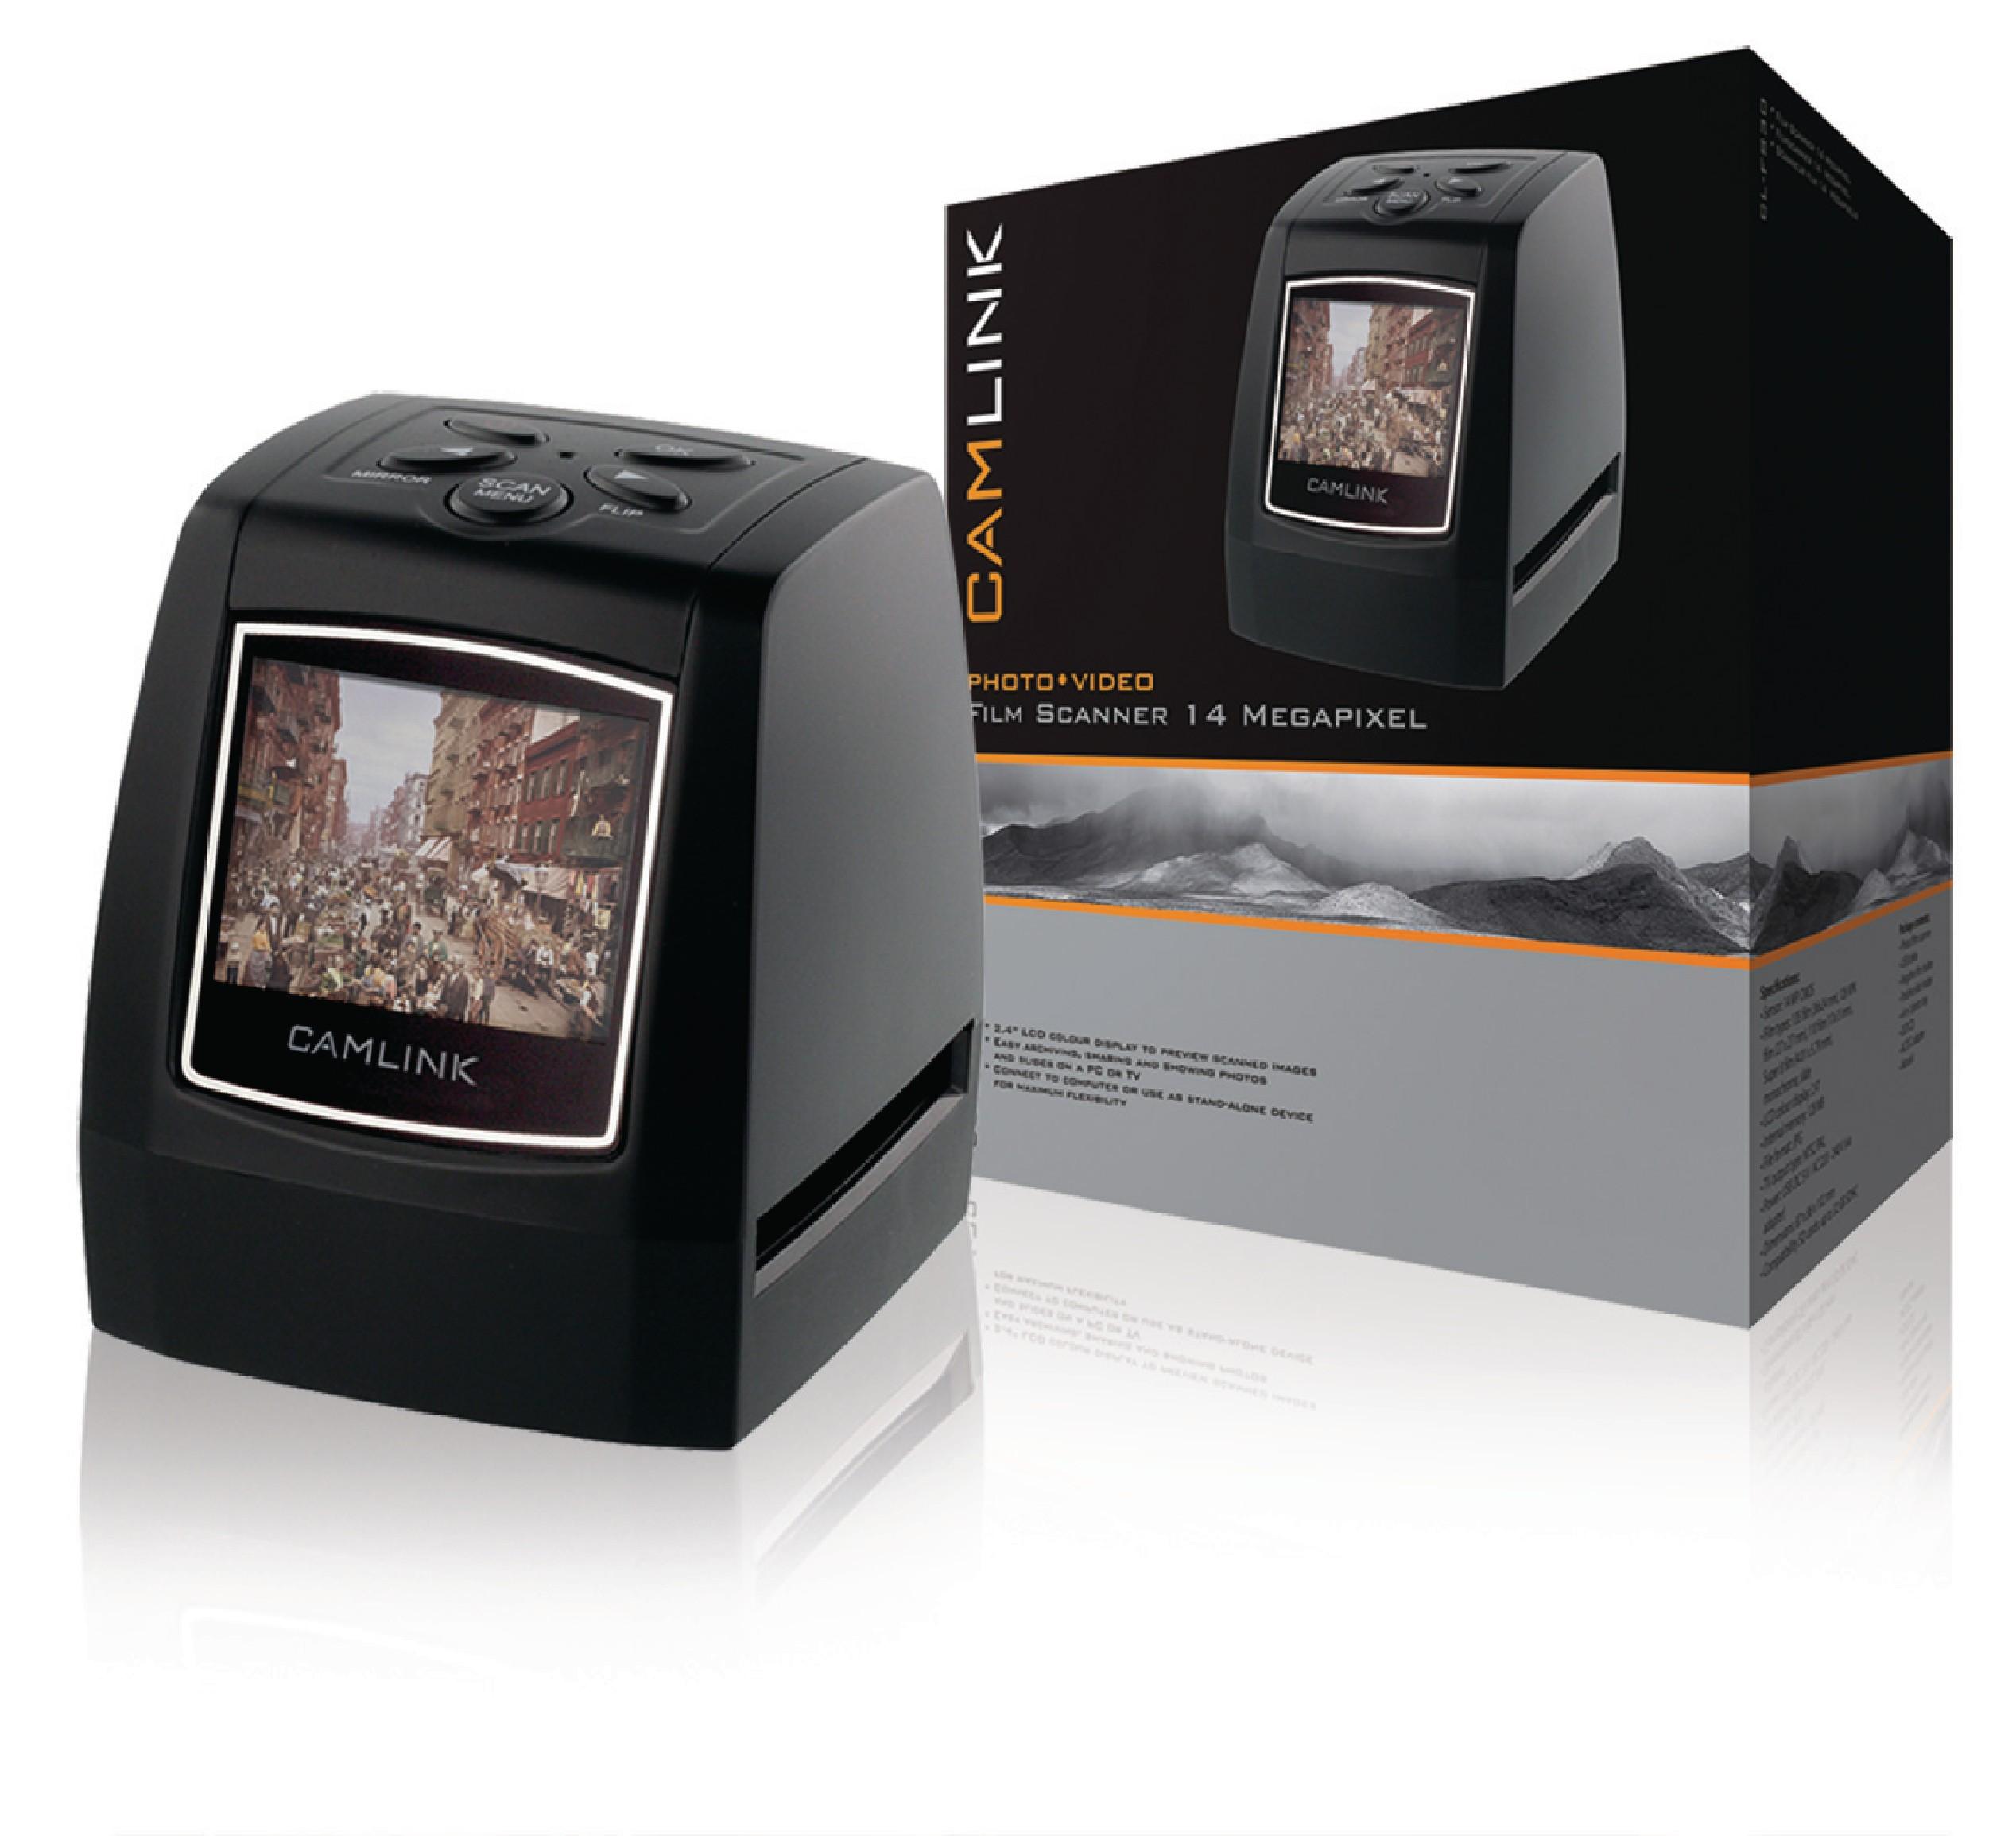 Filmový skener s LCD, 14 Mpixel, Camlink CL-FS30